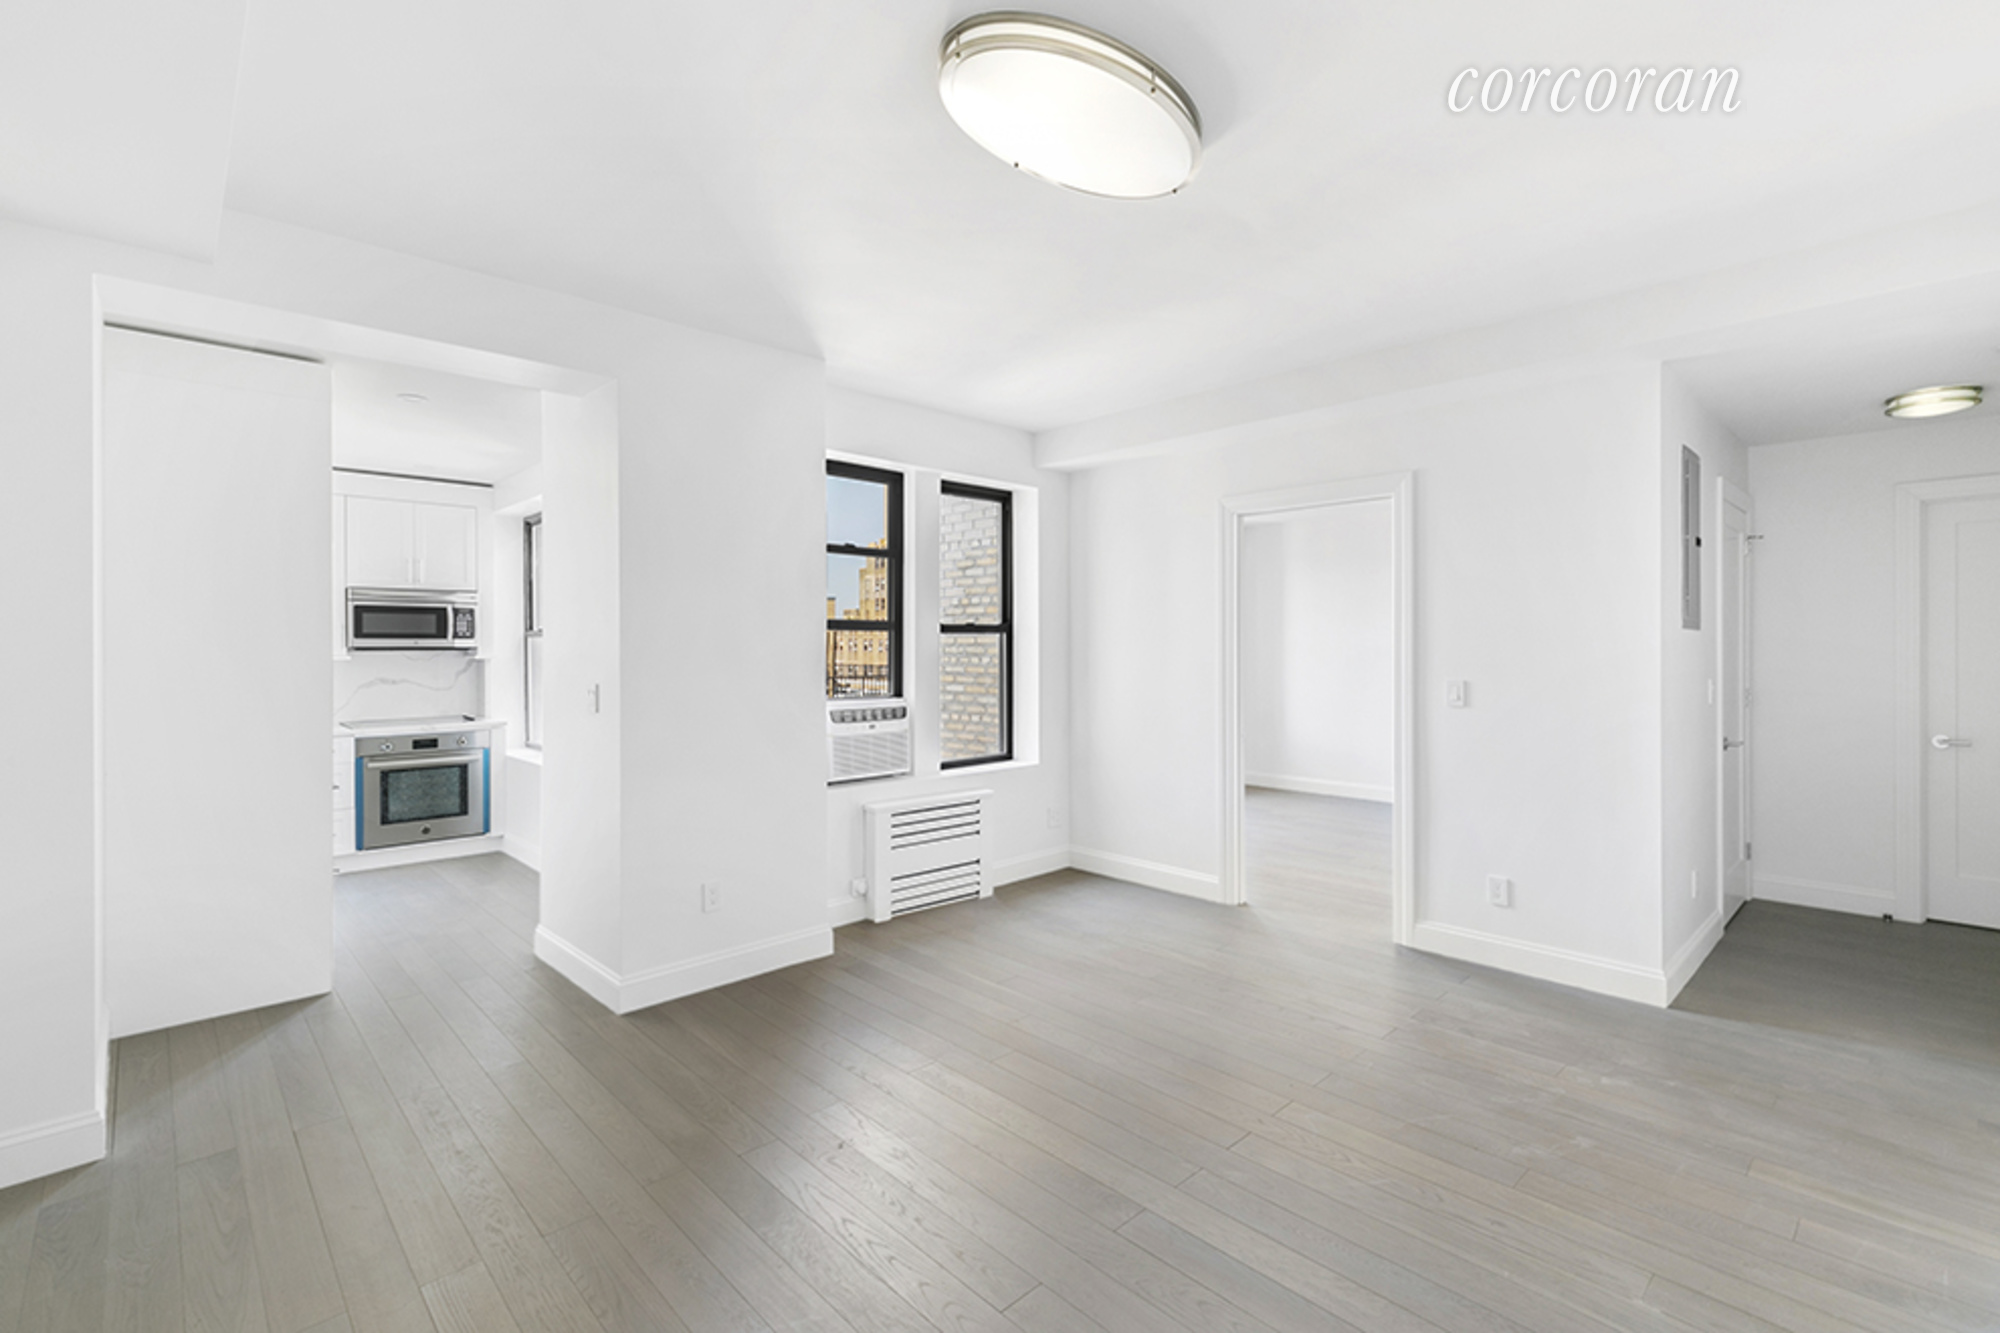 915 West End Avenue, Apt 203, Manhattan, New York 10025